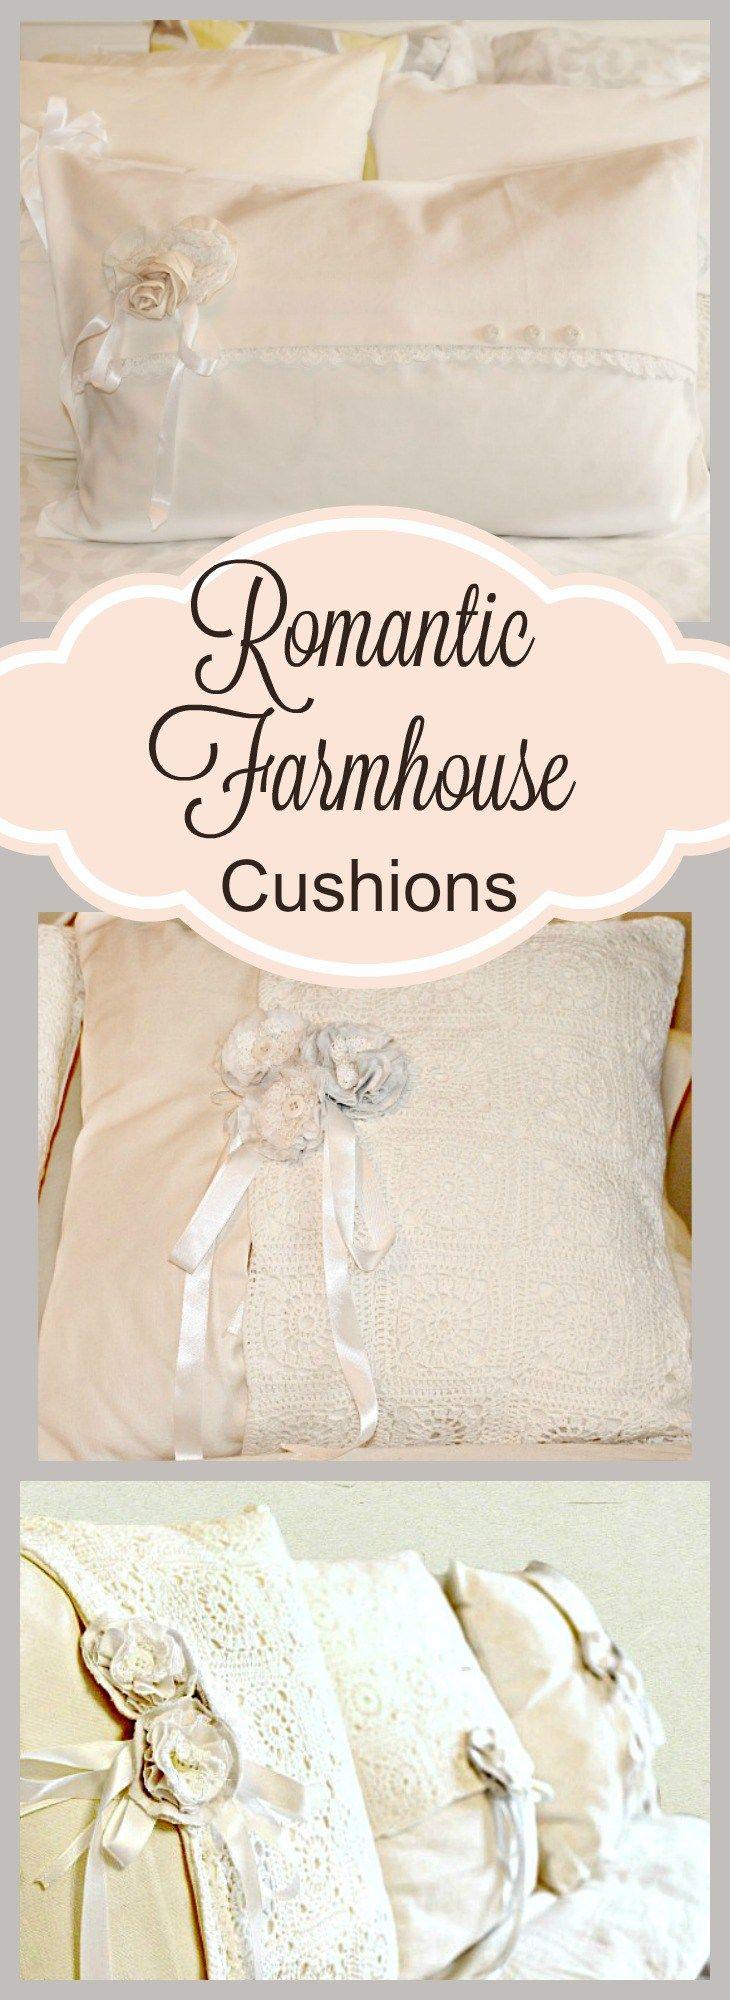 DIY Romantic Feminine Farmhouse Cushions | Tutorials, Cushion ...